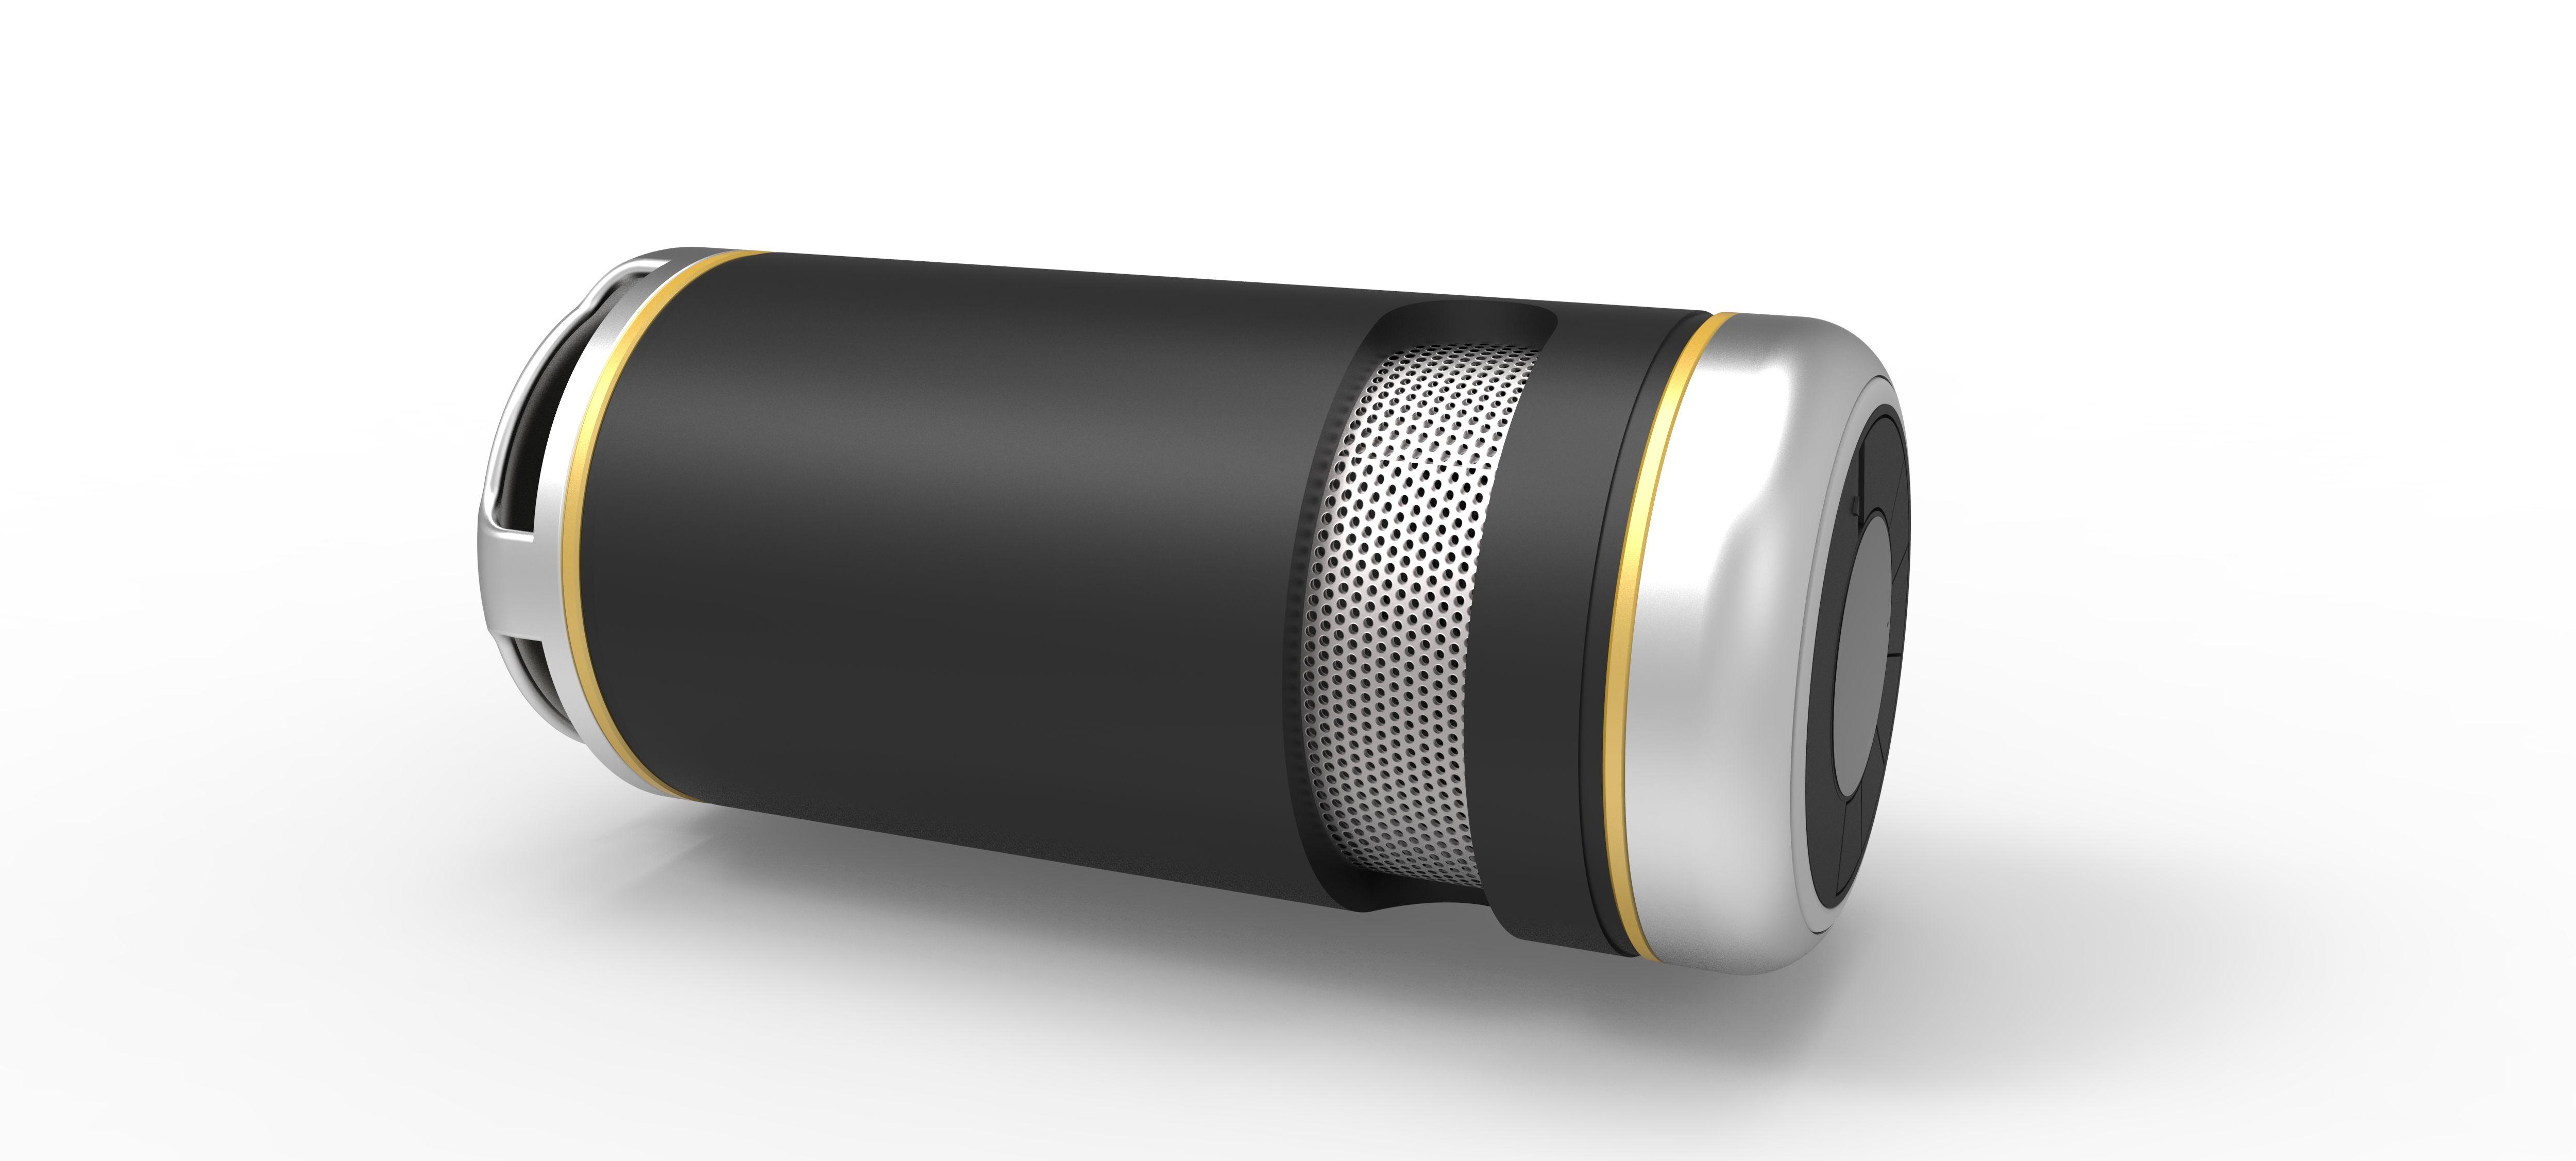 Circuito Bluetooth Casero : Pin de chris zuo en diy bluetooth speaker with built in screen